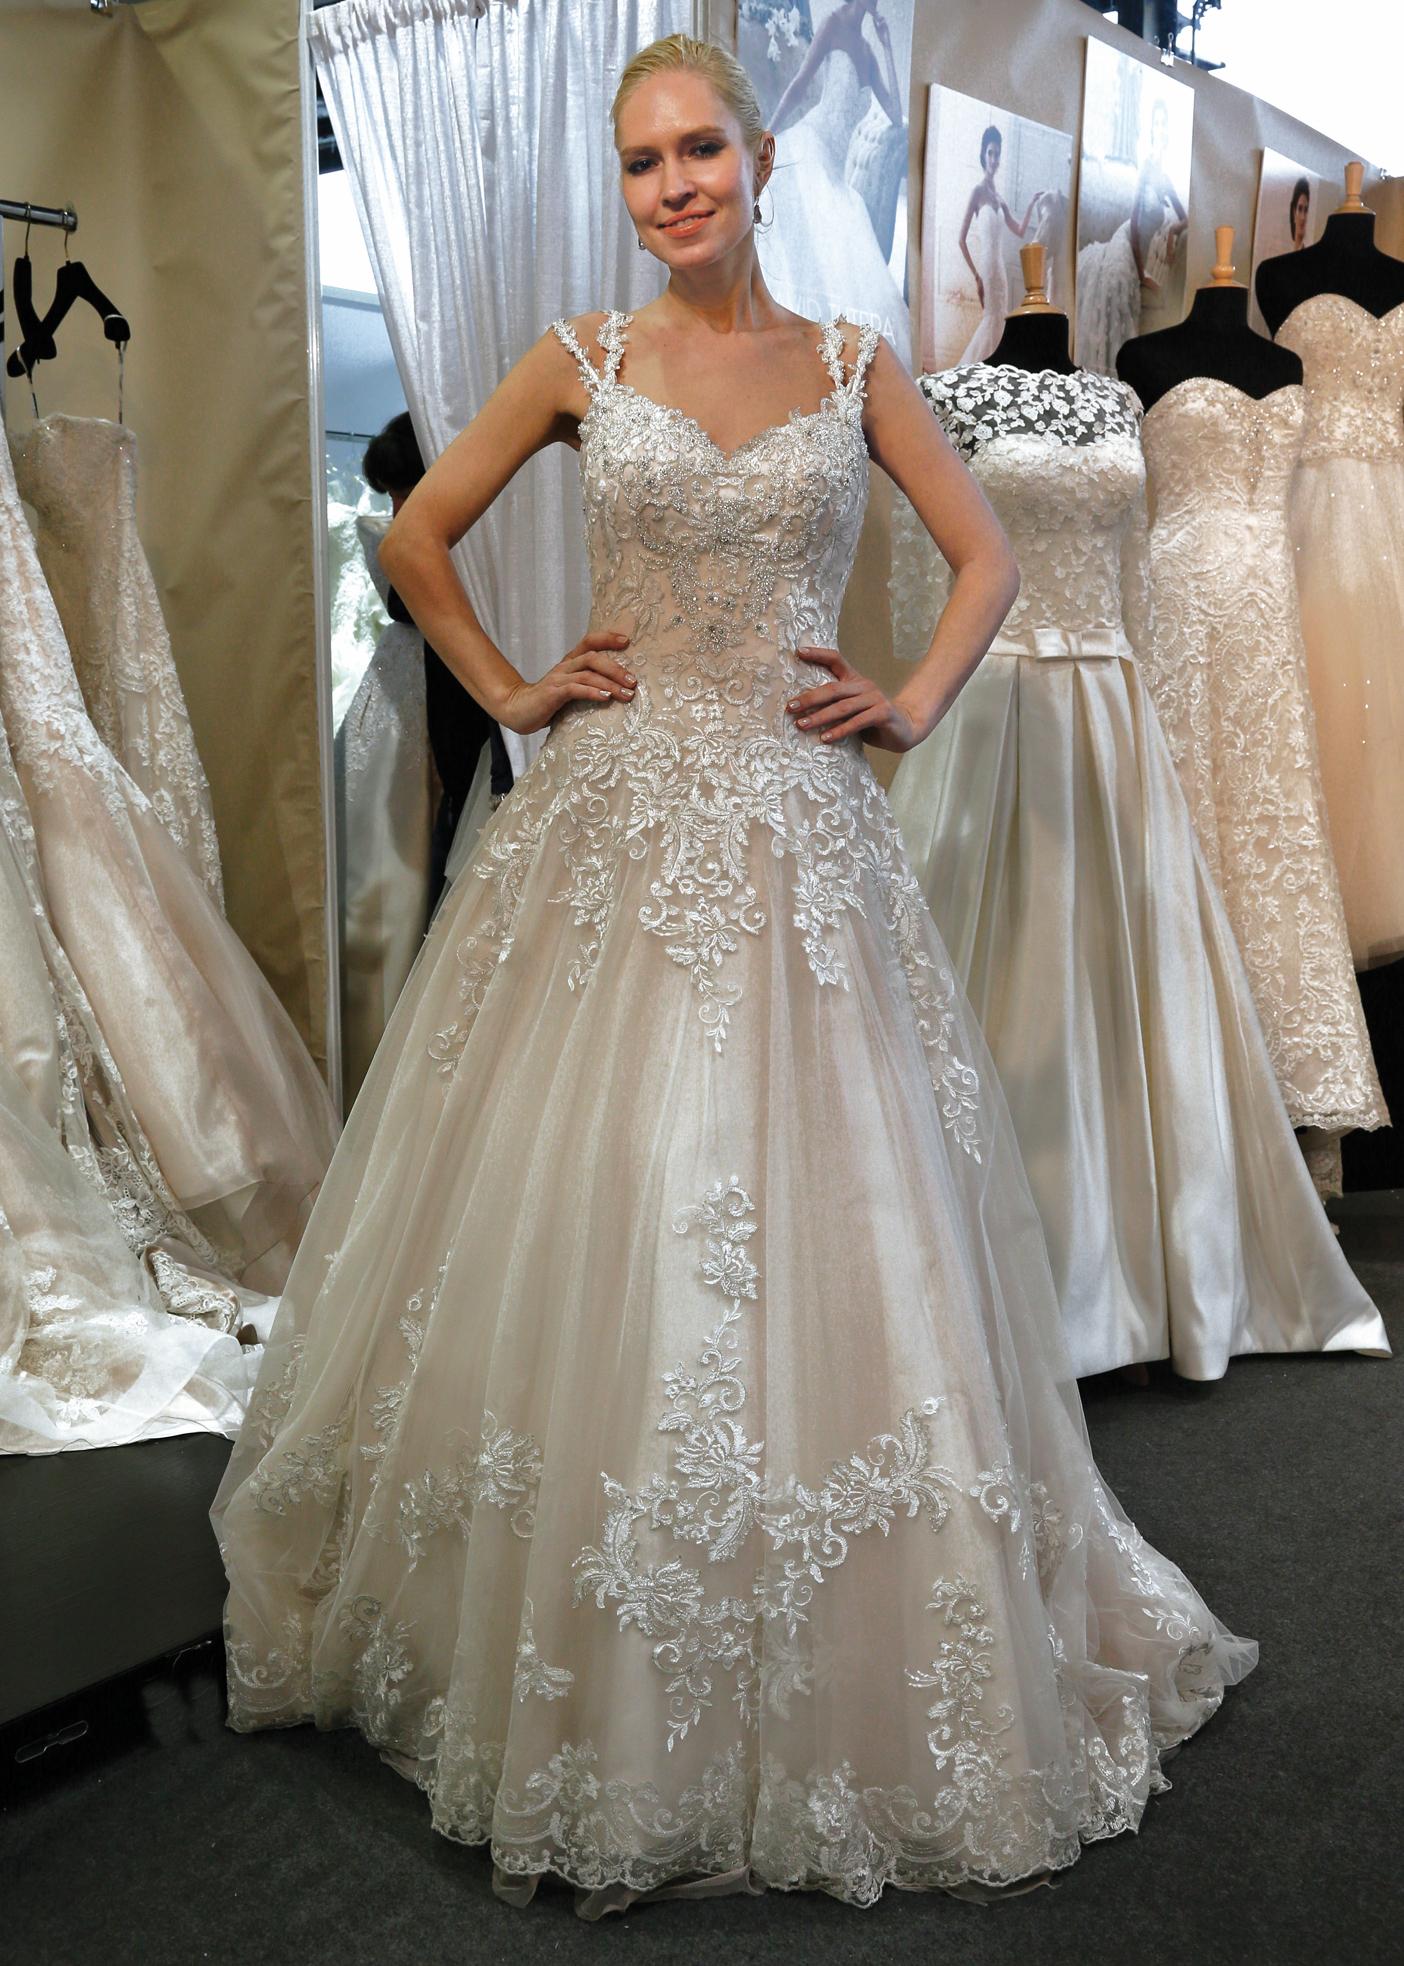 David tutera for mon cheri vintage ballgown wedding dress for Wedding dress alterations cost david s bridal